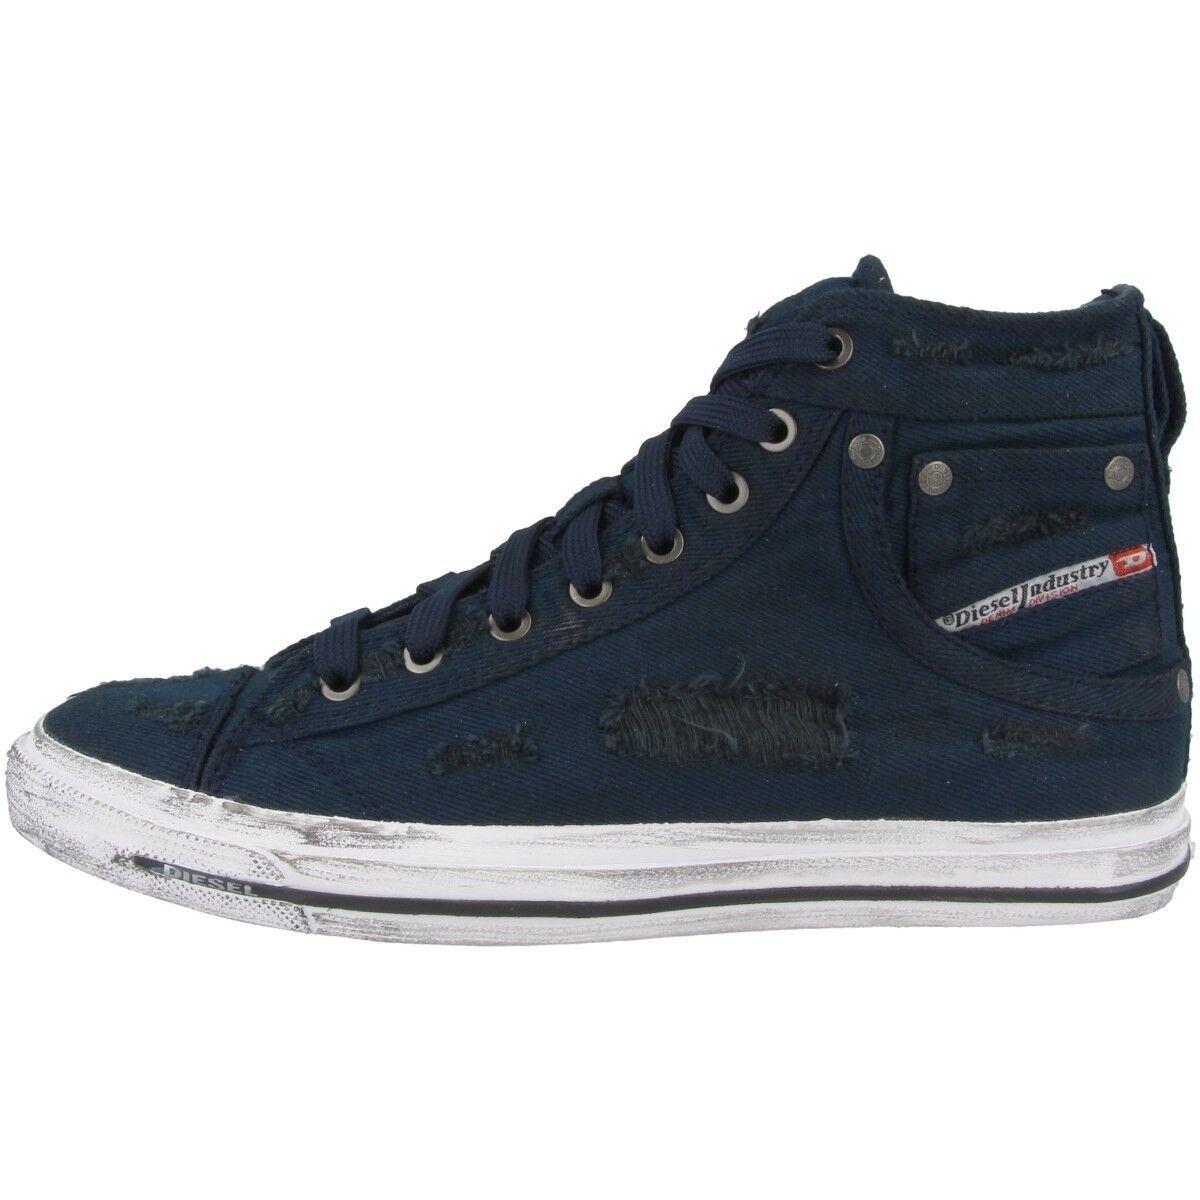 Diesel Exposure I Schuhe High High High Top Freizeit Sneaker Blau Y00023-P1728-T6065 5bcae3